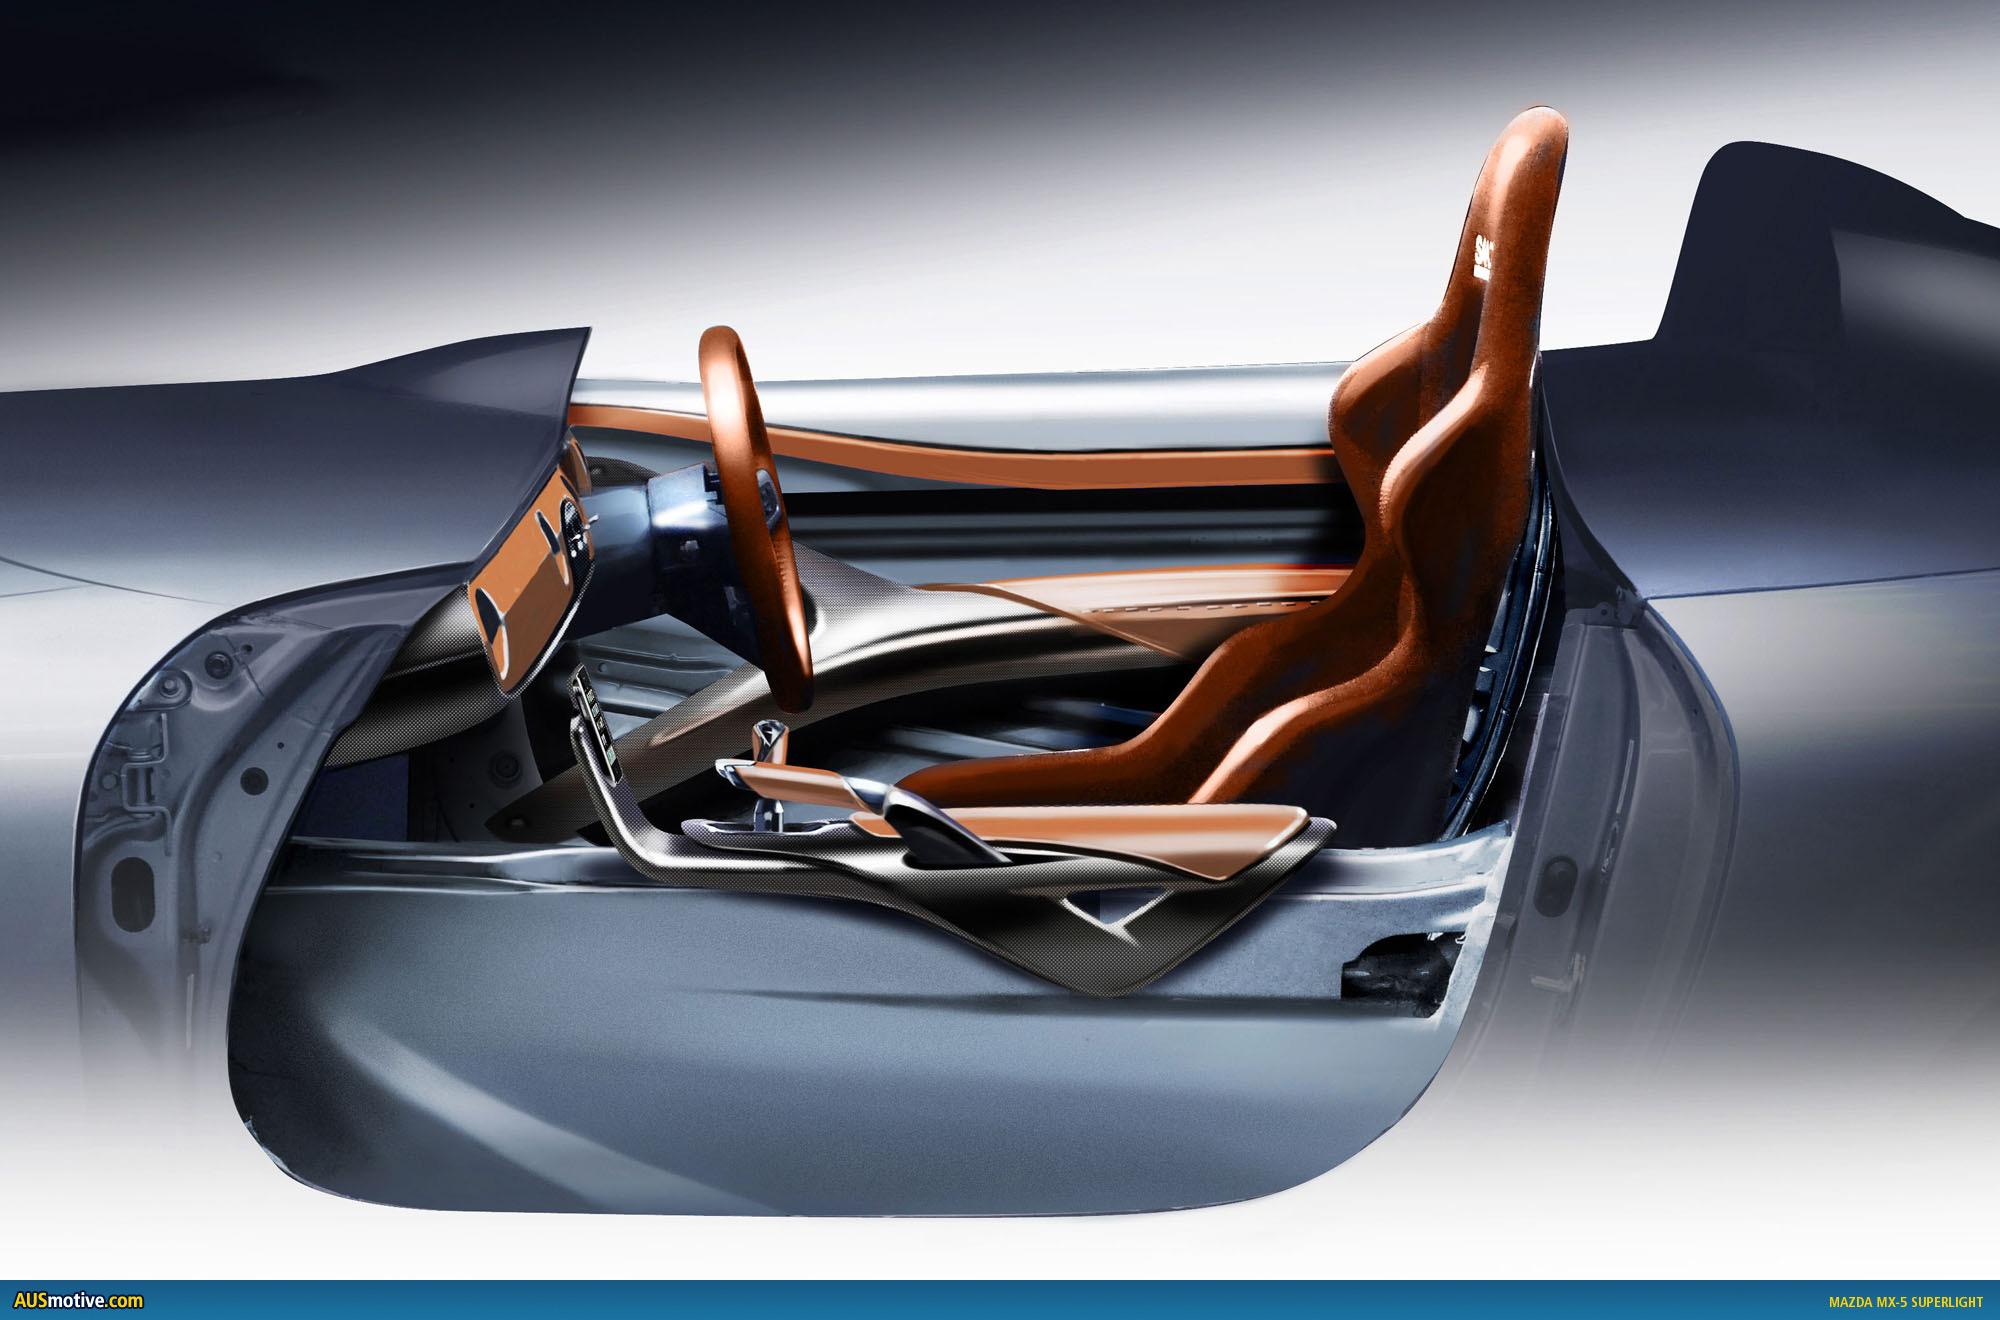 http://www.ausmotive.com/images/Mazda-MX-5-Superlight-IAA-11.jpg